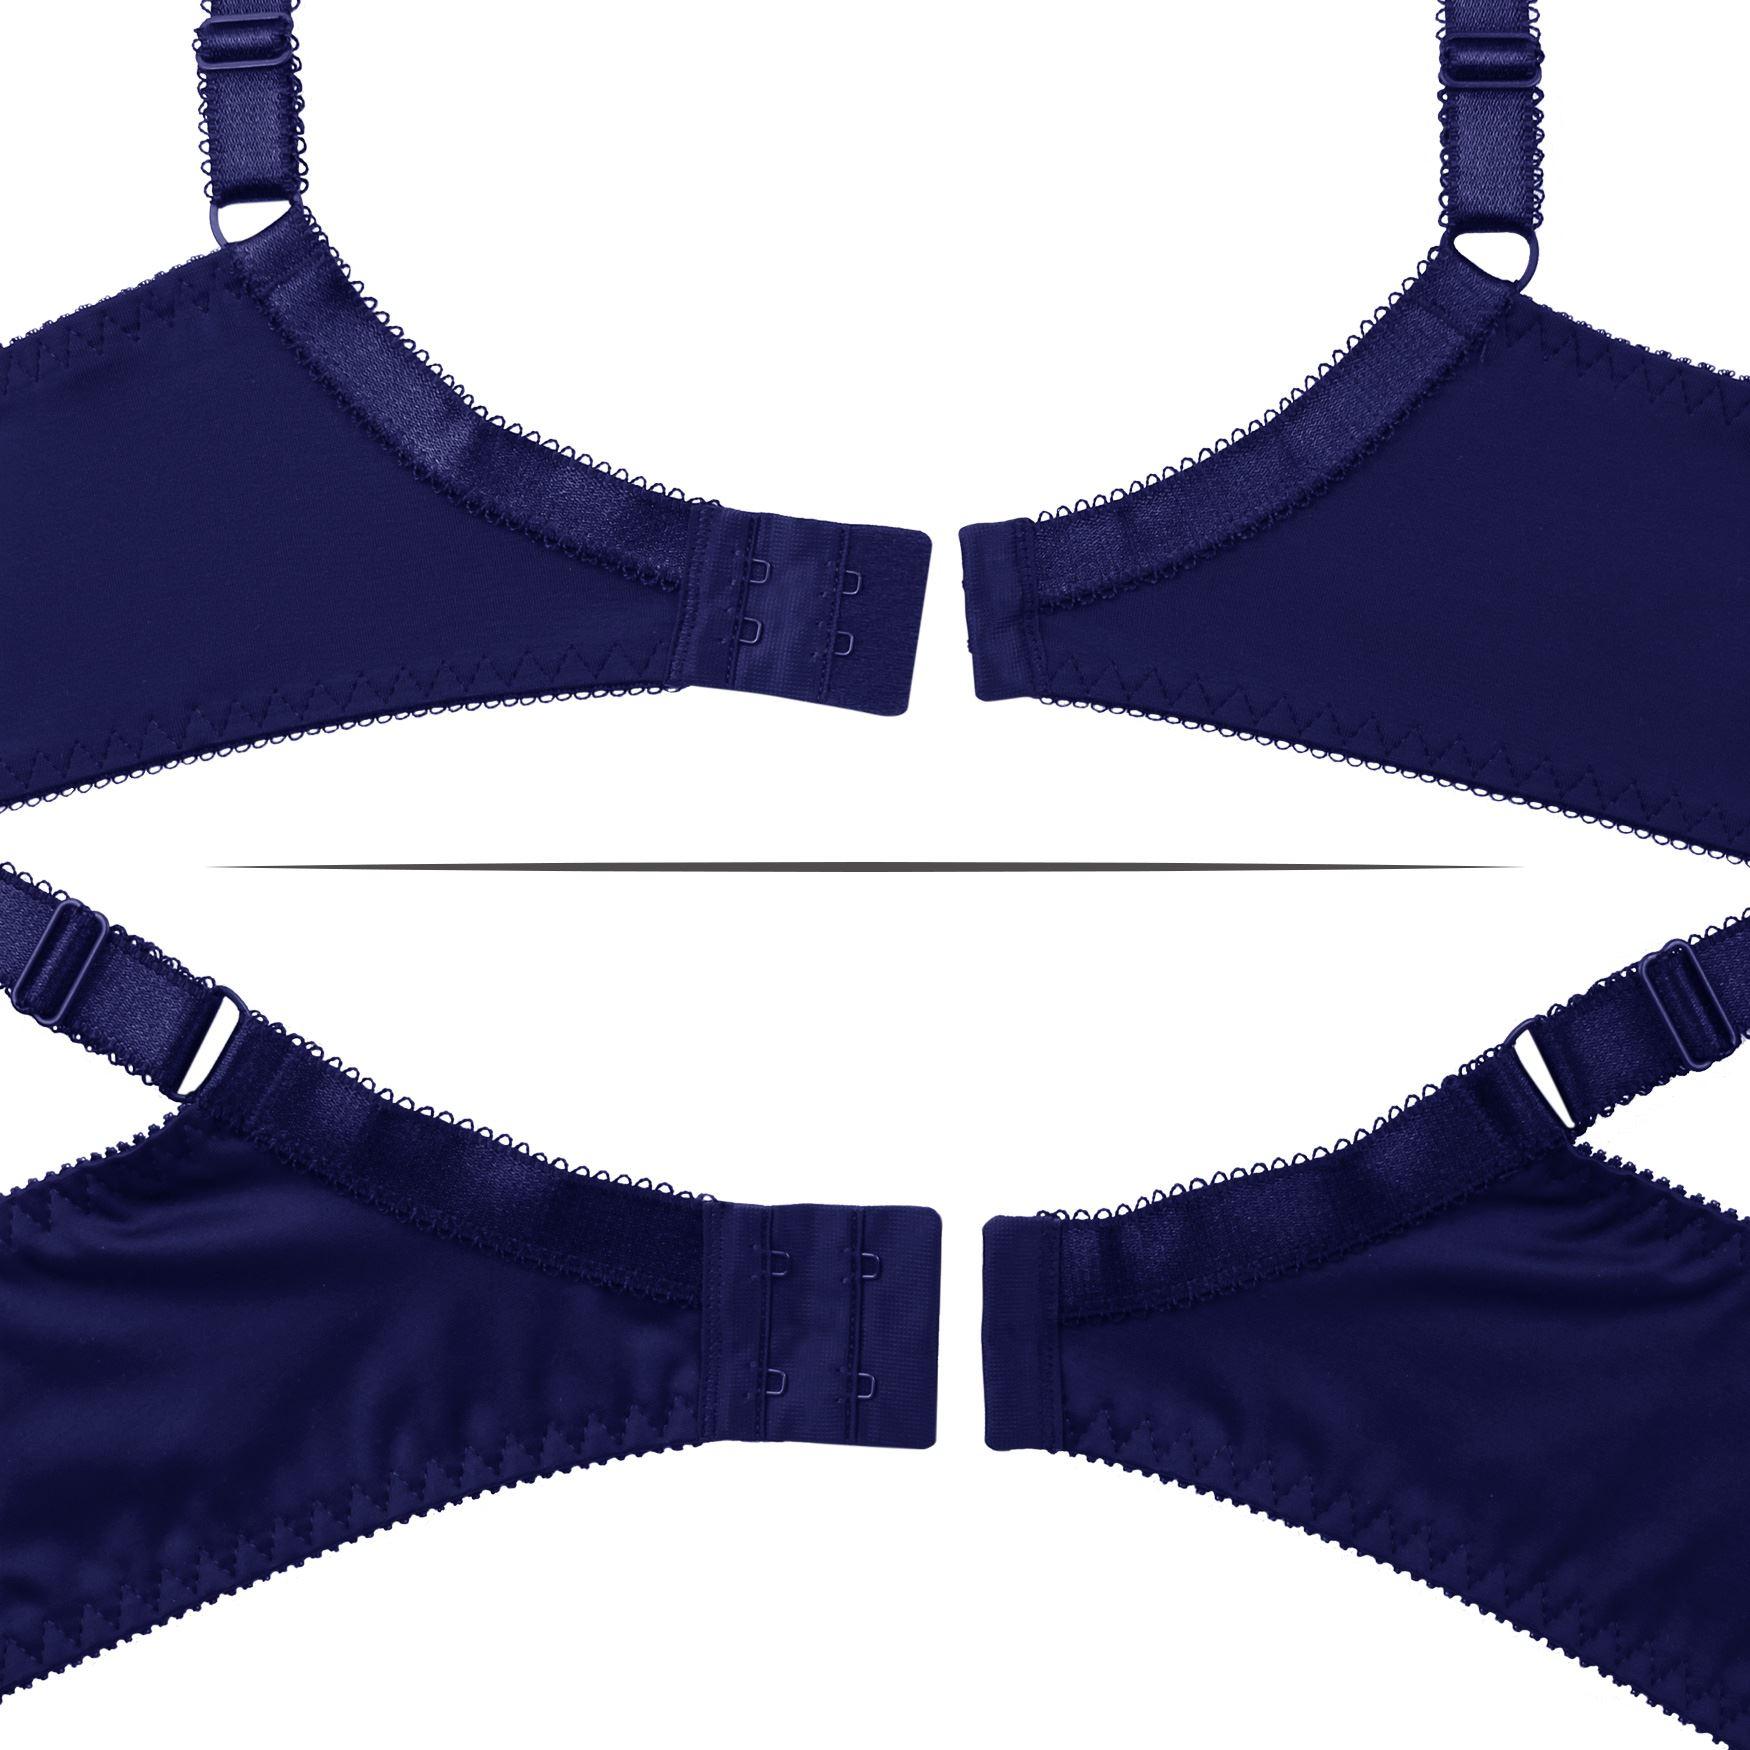 Plus-Size-Full-Coverage-Underwire-Minimizer-Padded-Comfortable-Lace-Figure-Bra thumbnail 16